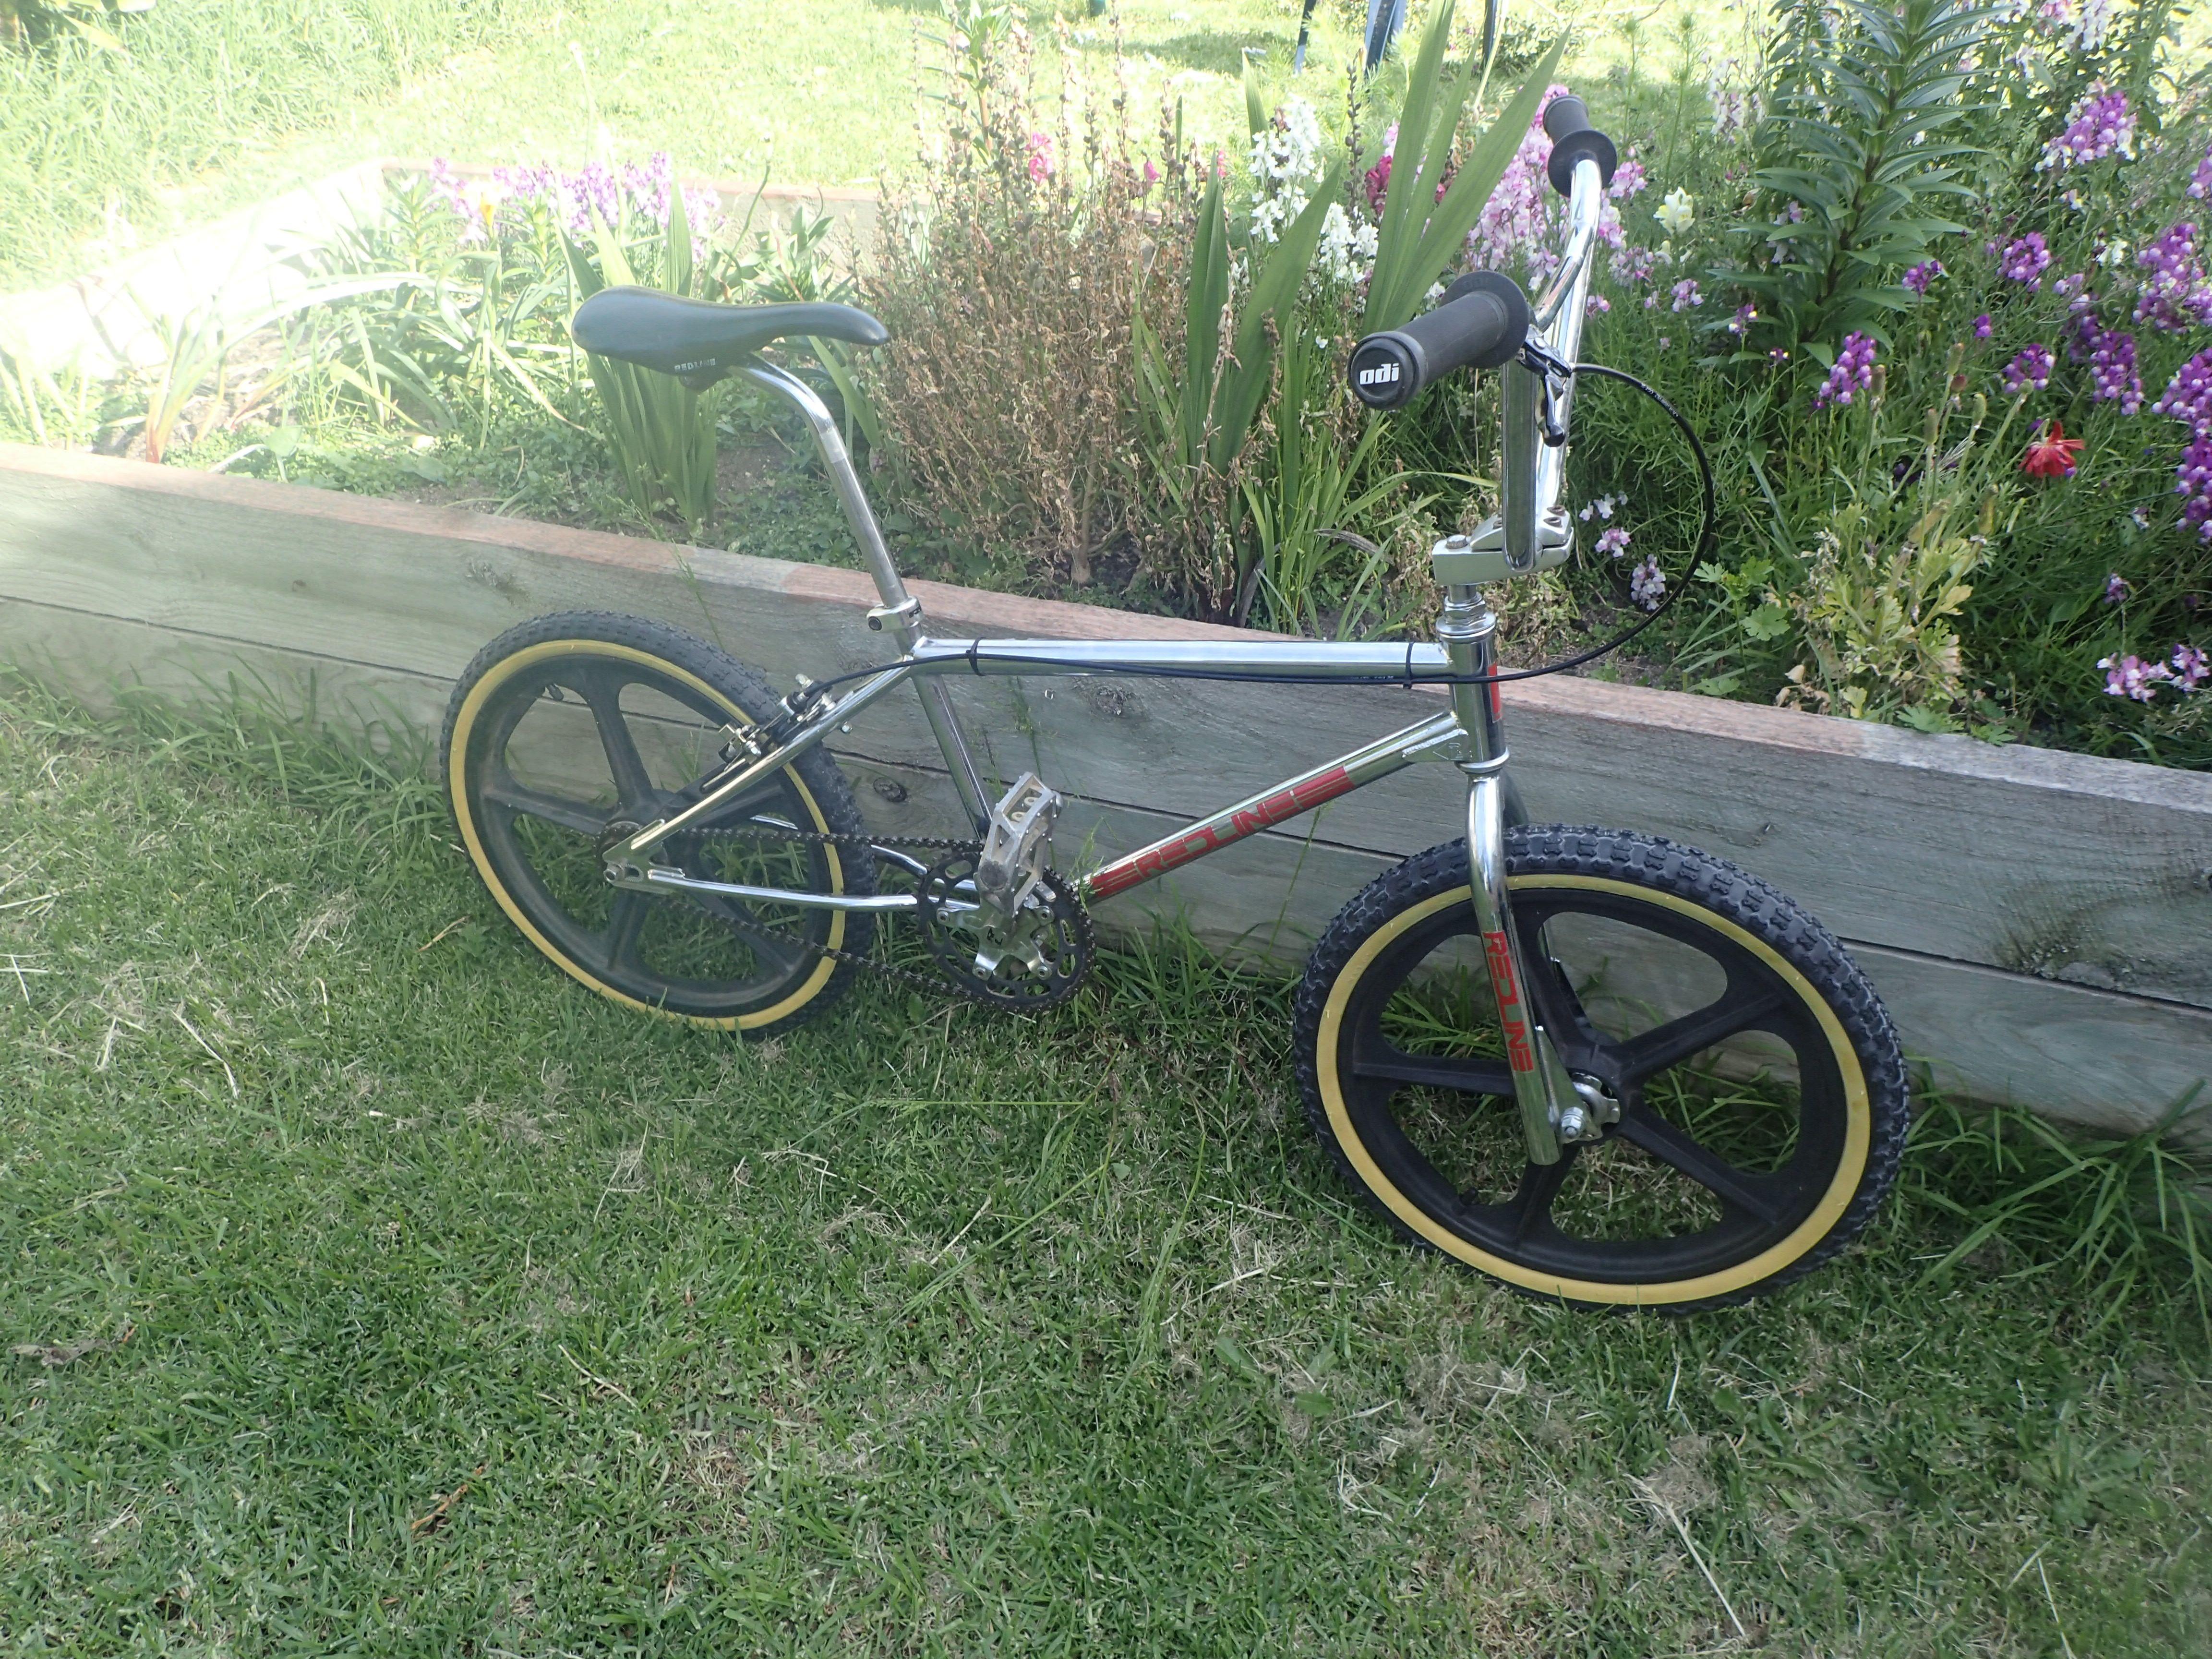 Sale for redline bikes bmx Redline BMX